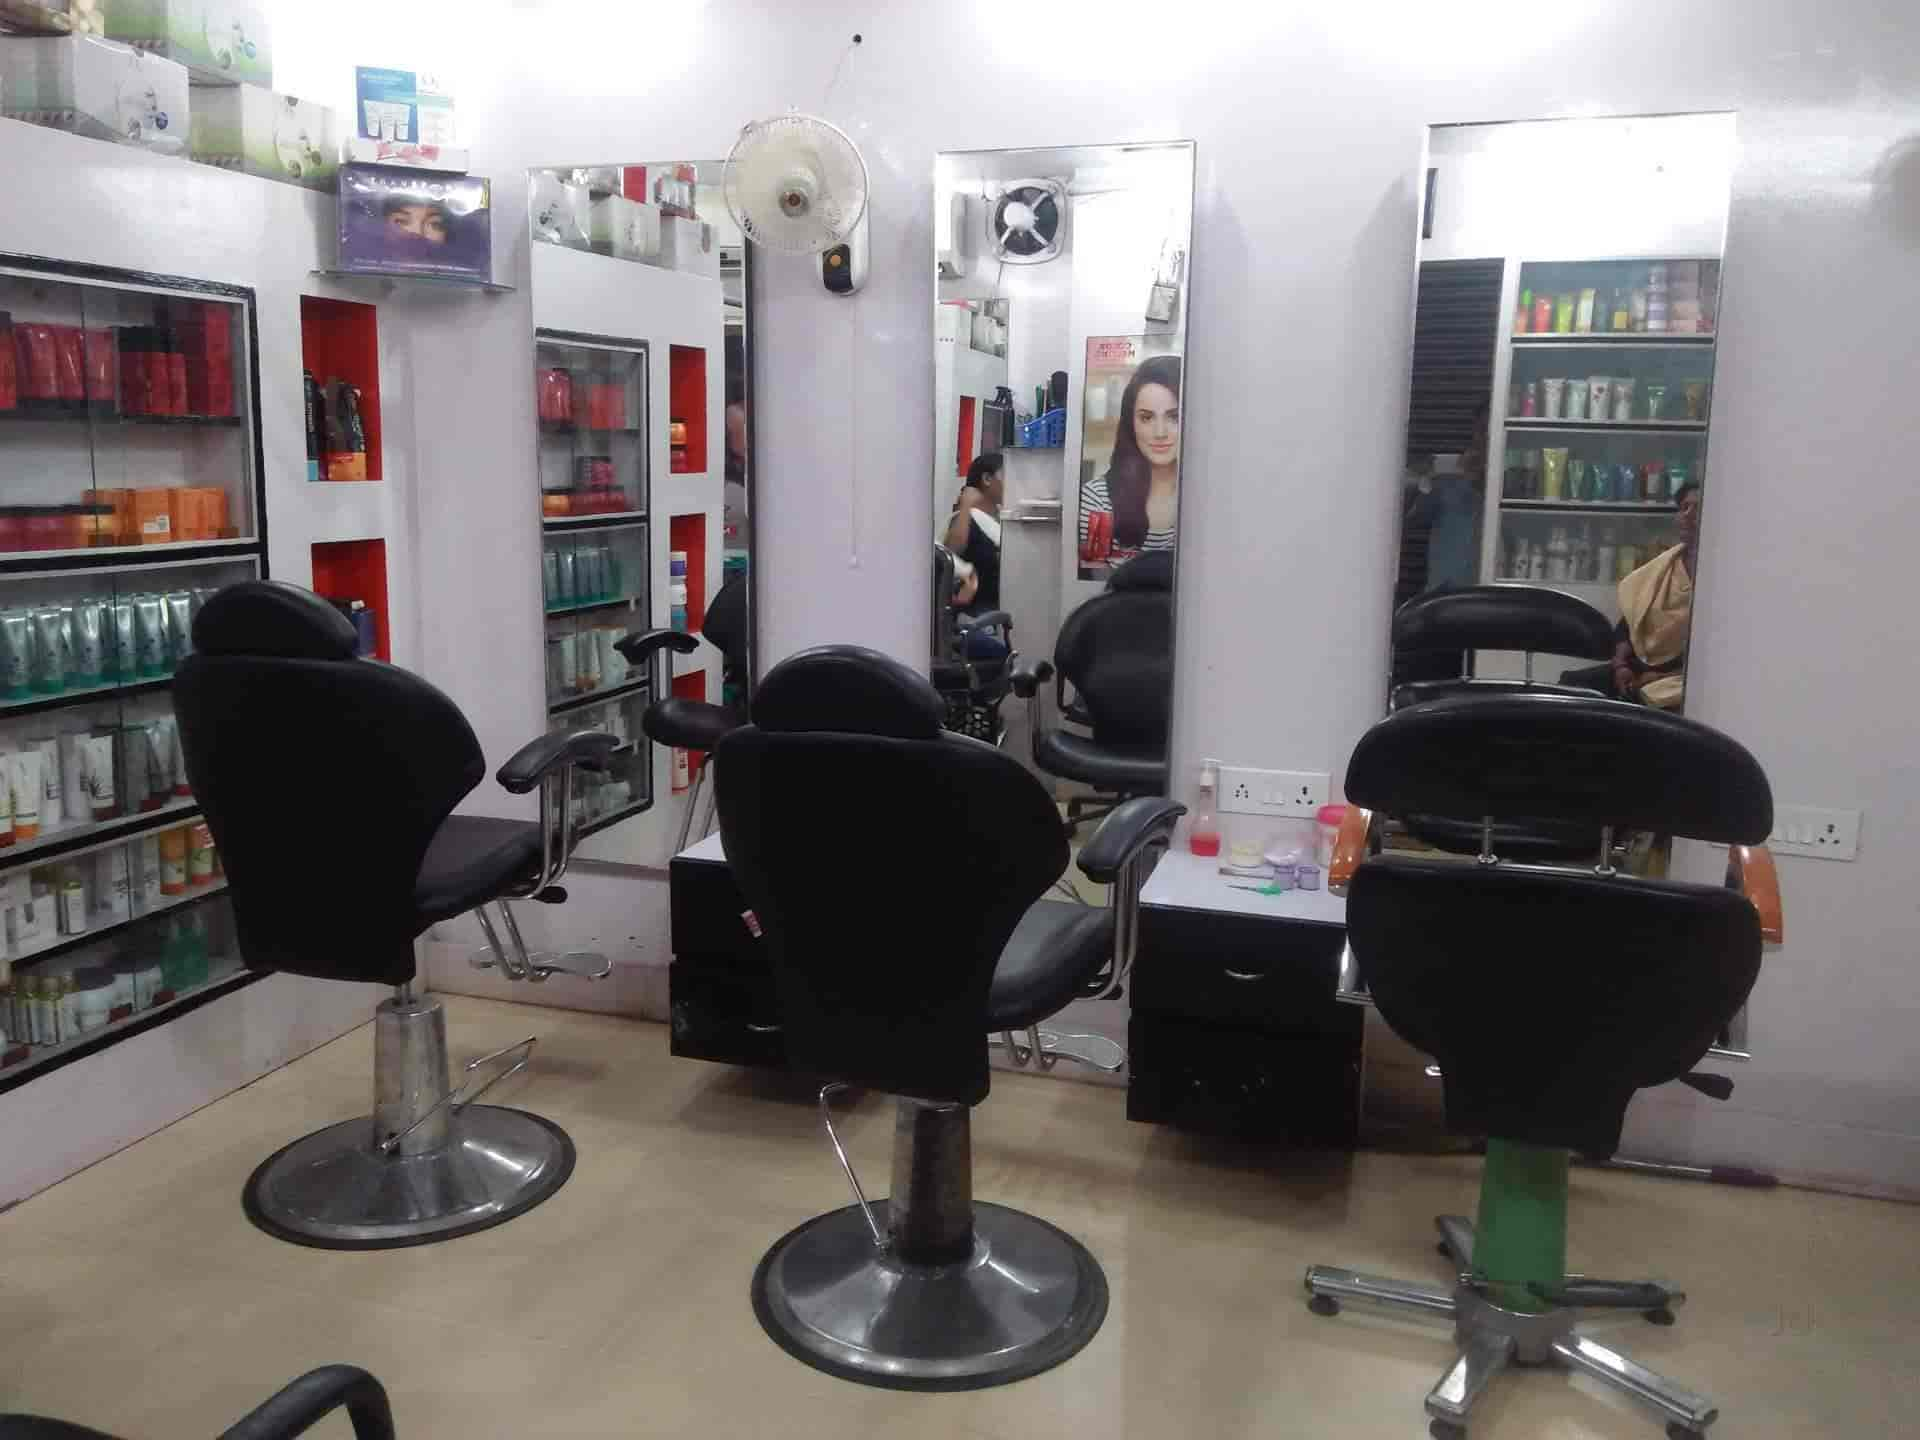 Top 16 Women Beauty Parlours in Muzaffarpur - Justdial